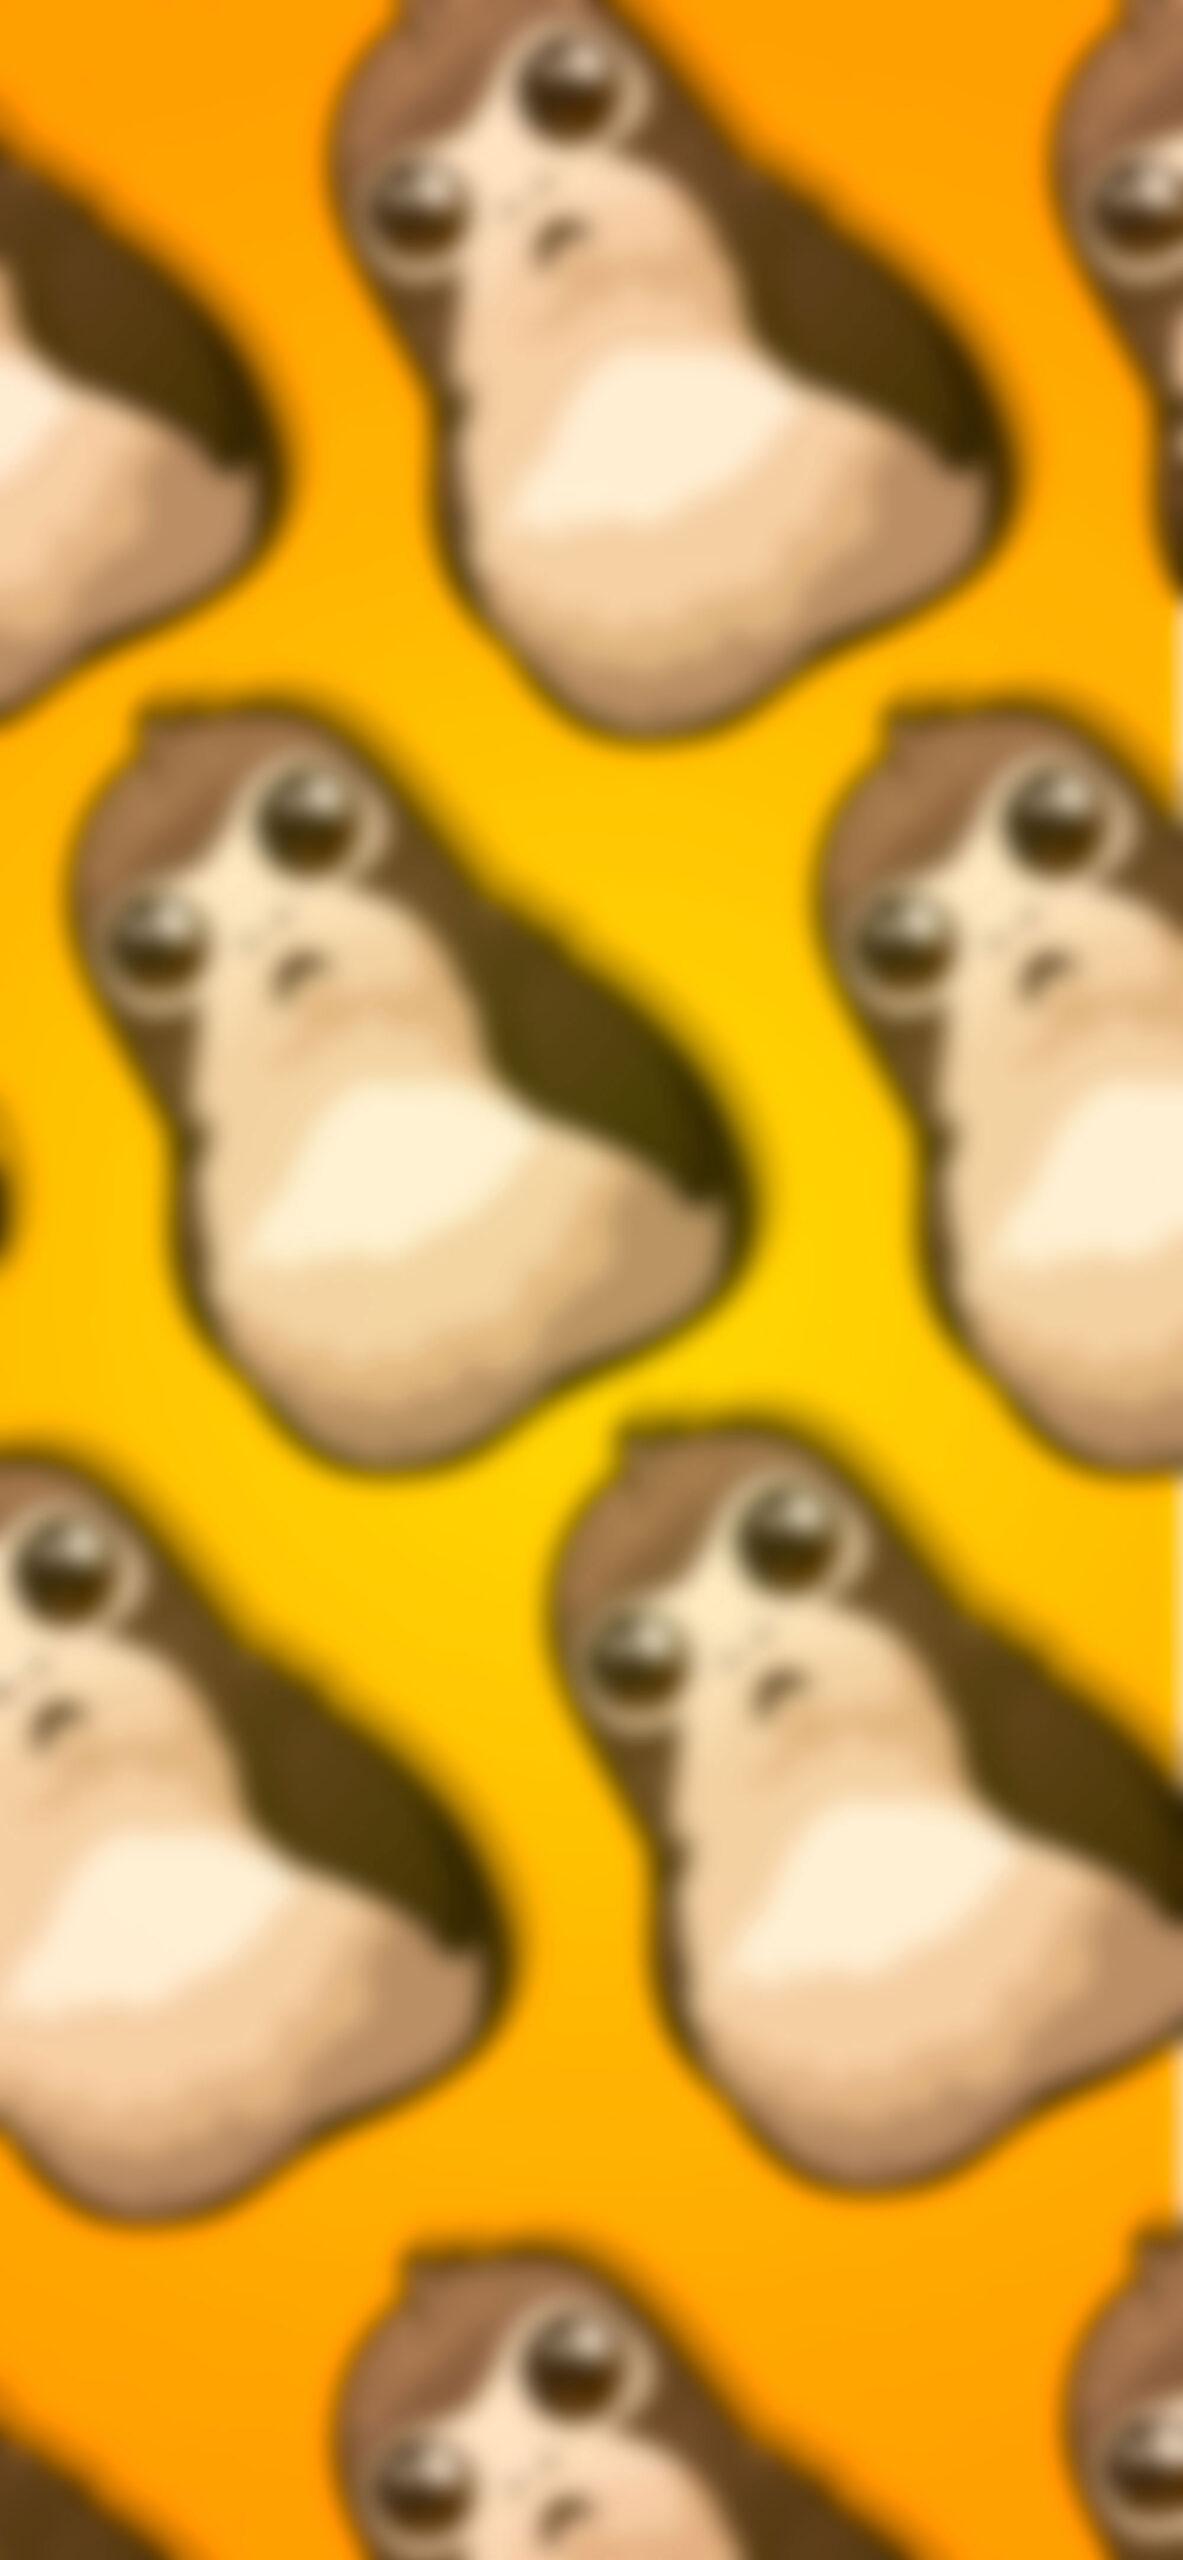 star wars porg yellow blur wallpaper